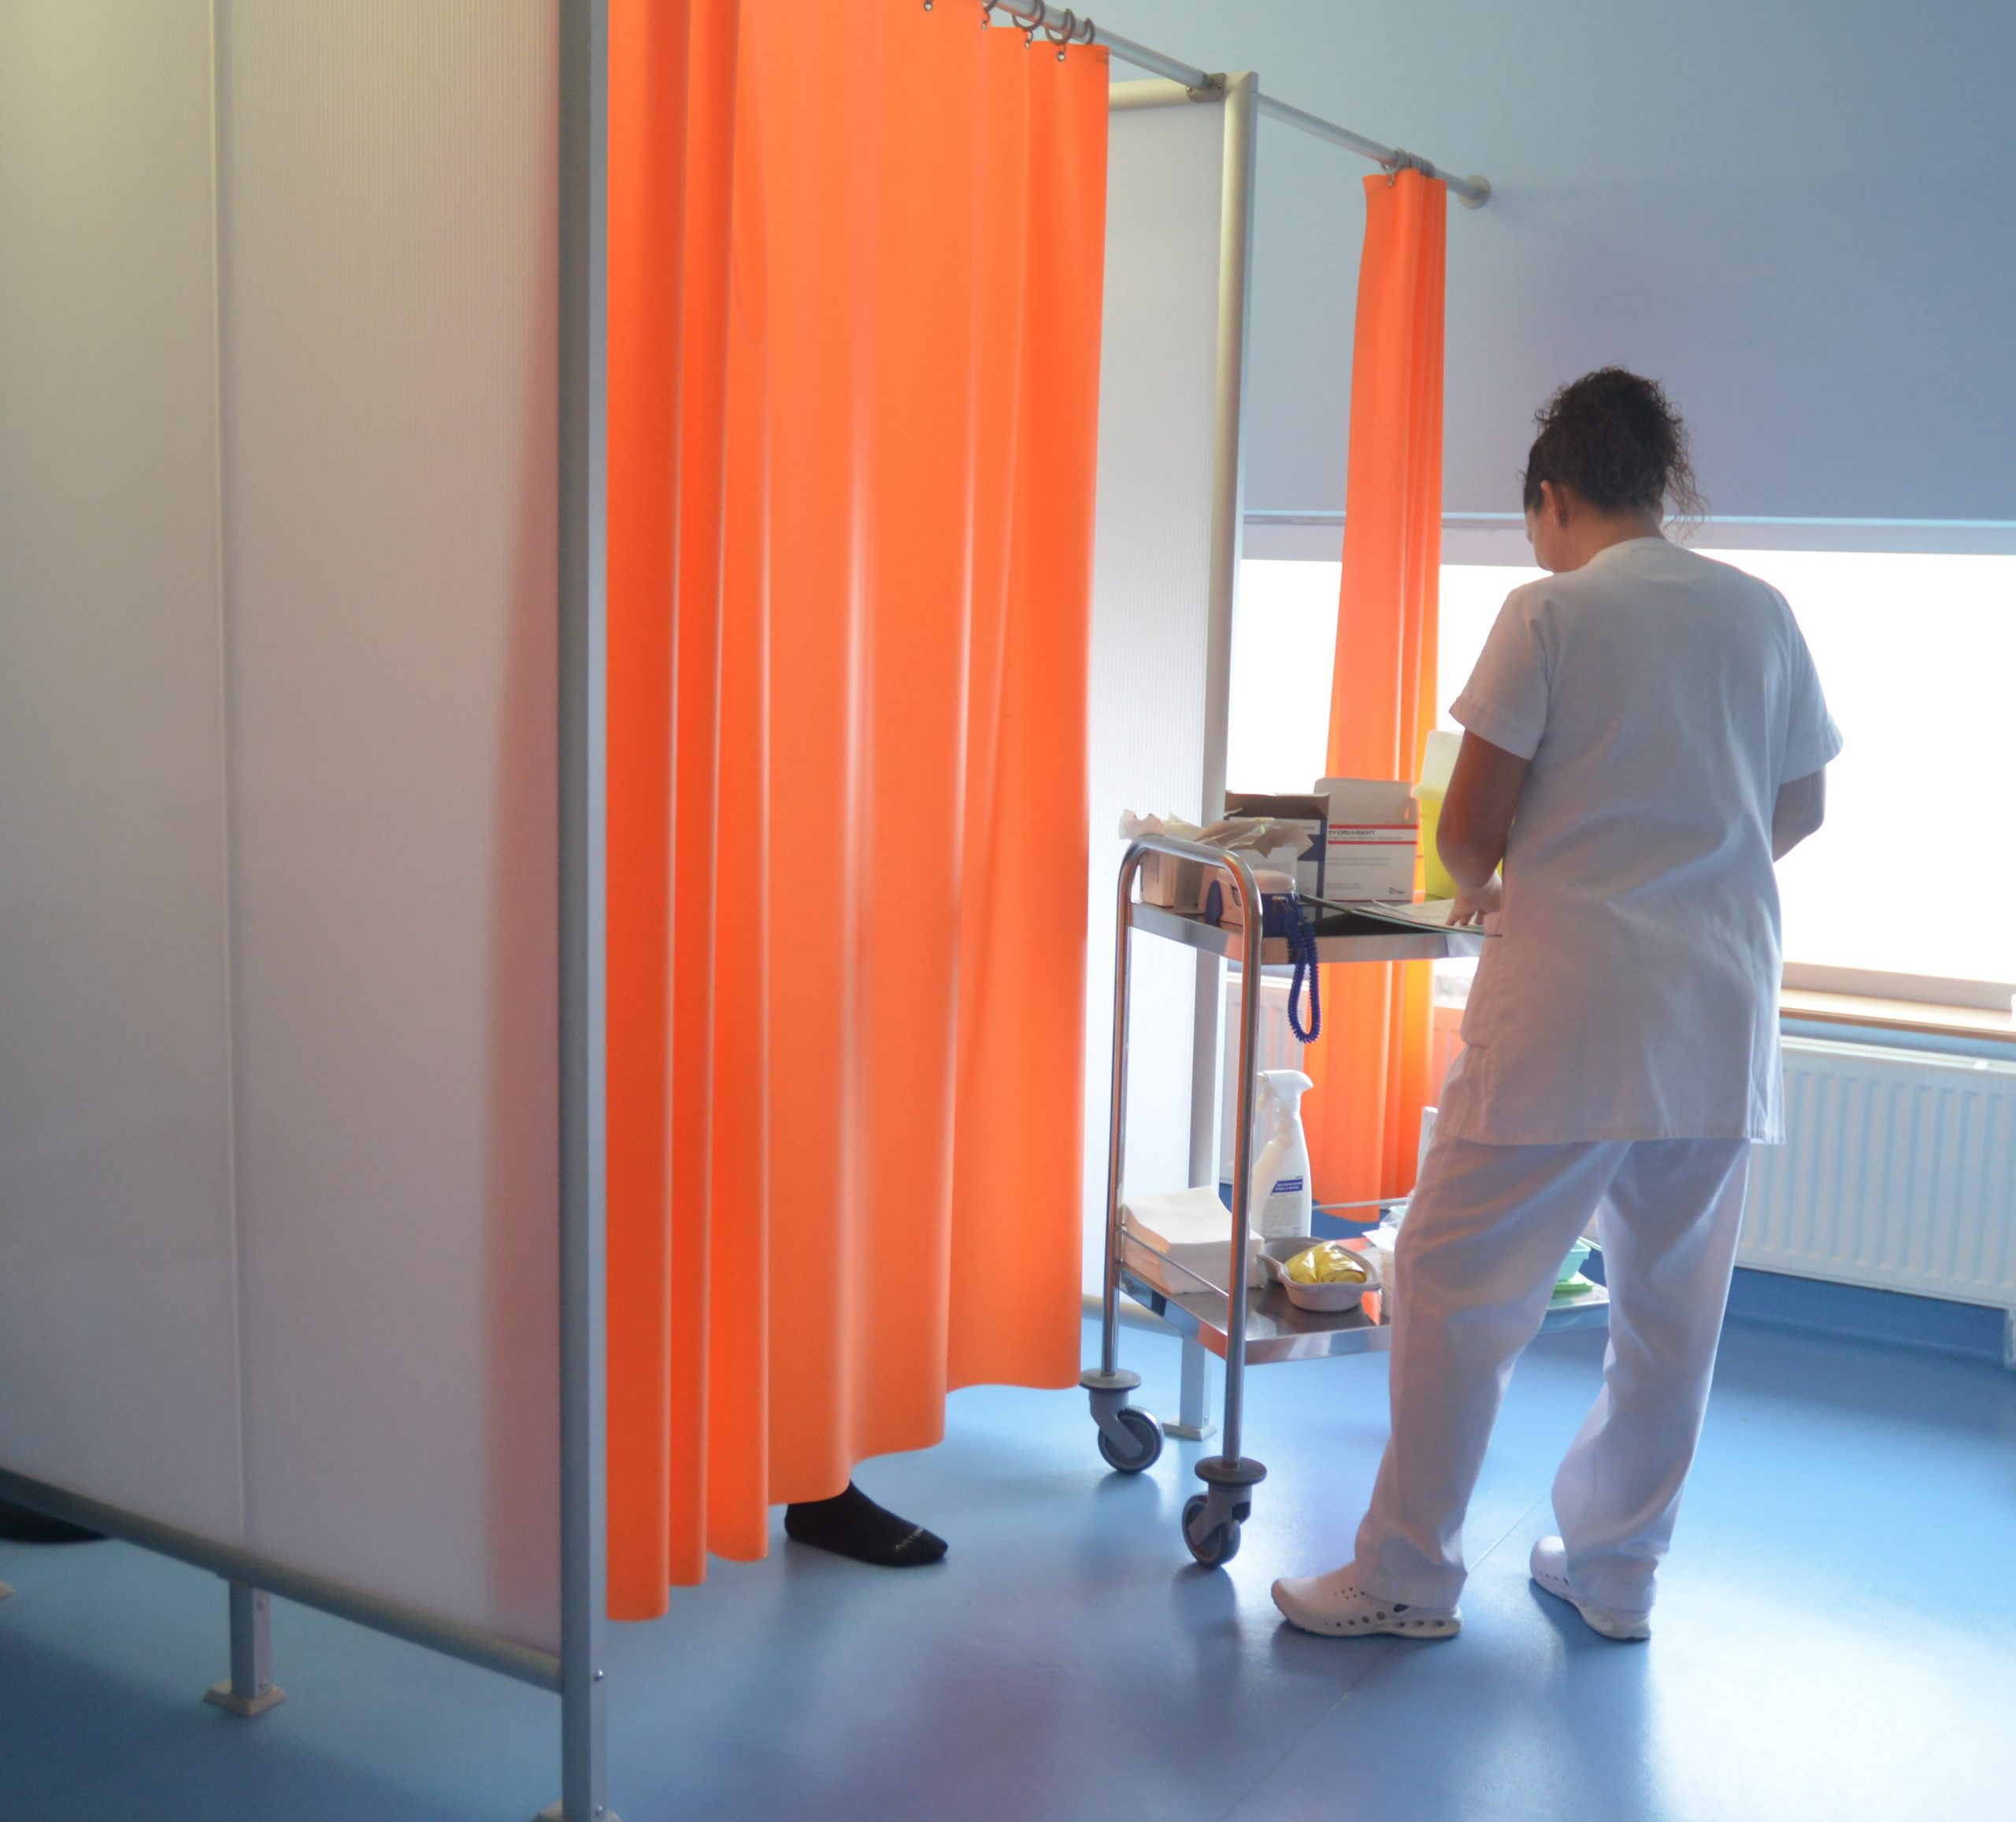 Ressources humaines - étude de cas- hospitalier